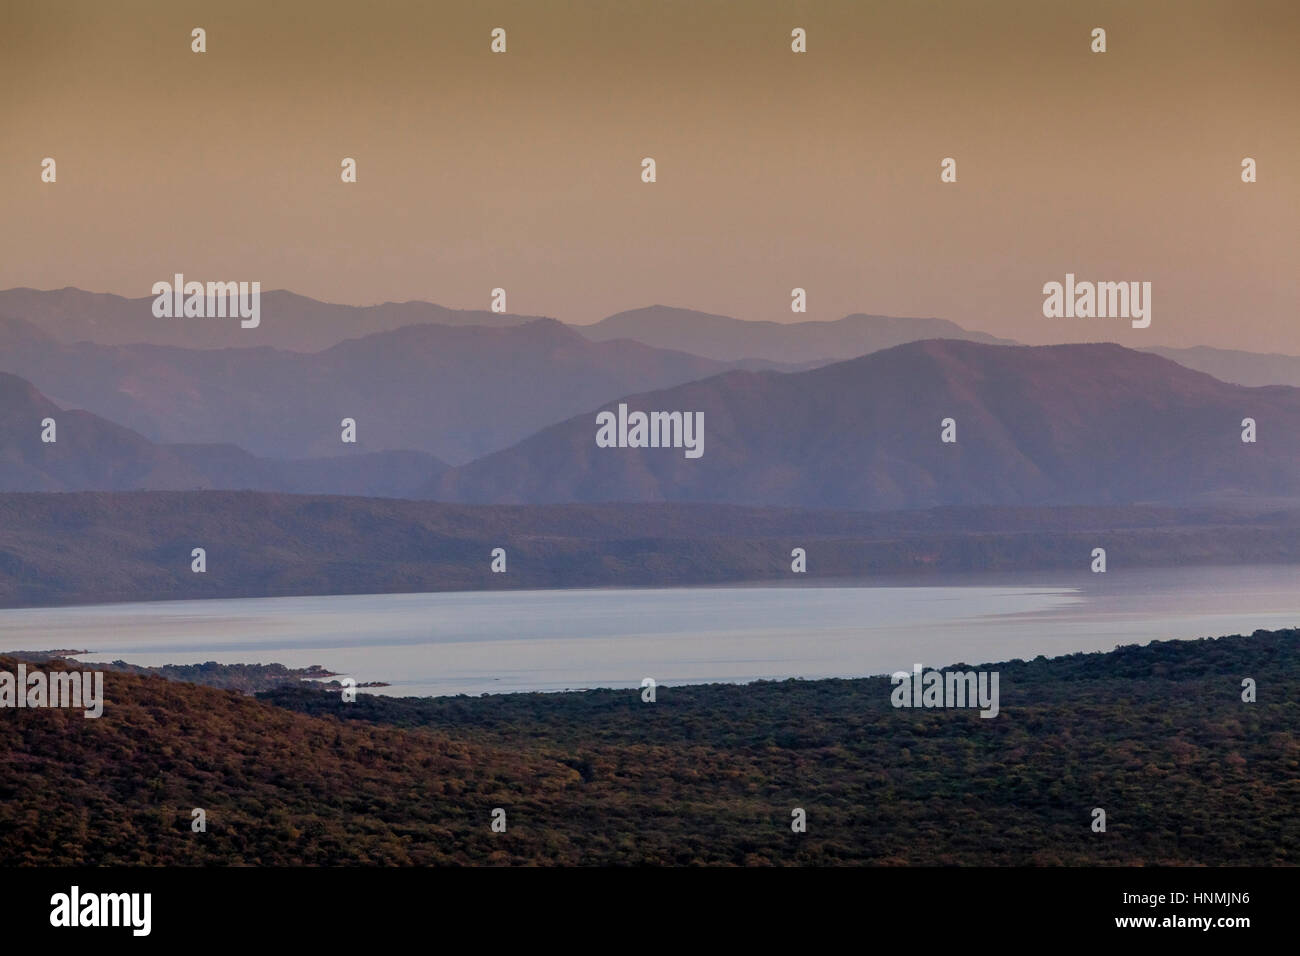 Lake Chamo, Nechisar National Park, Arba Minch, Ethiopia Stock Photo